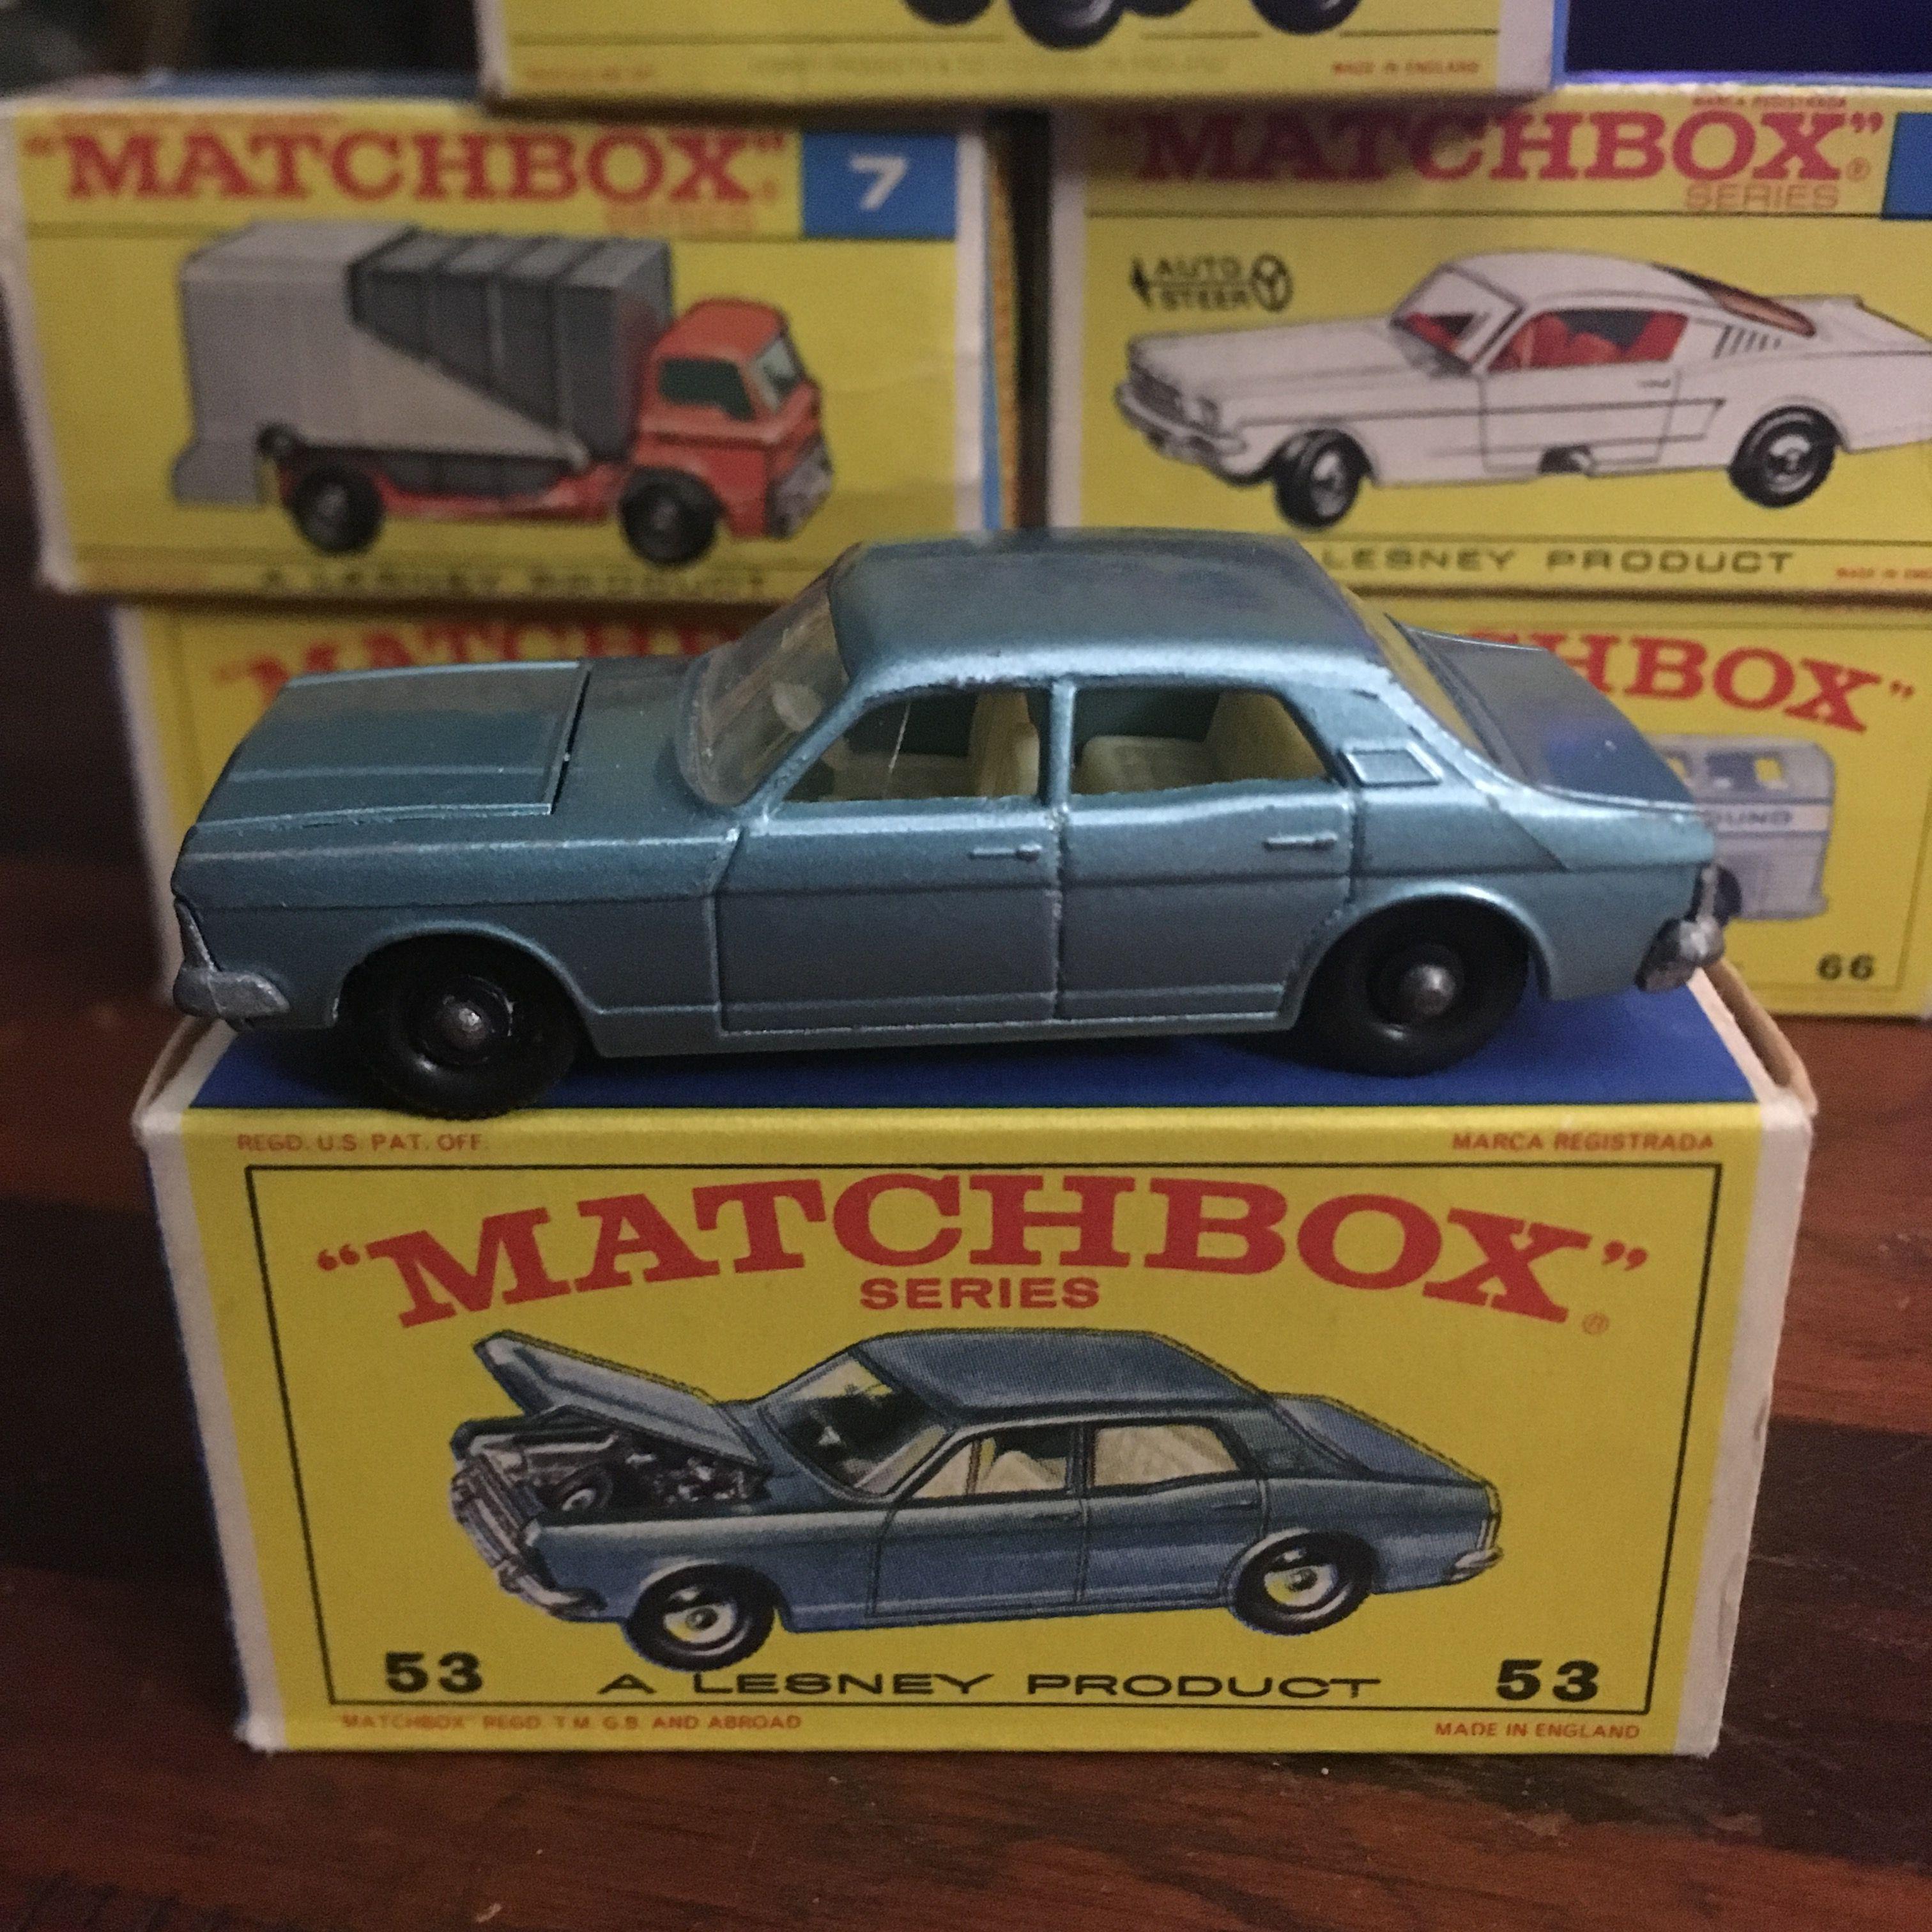 53 Ford Zodiac Mk Iv Toy Model Cars Matchbox Cars Miniature Cars